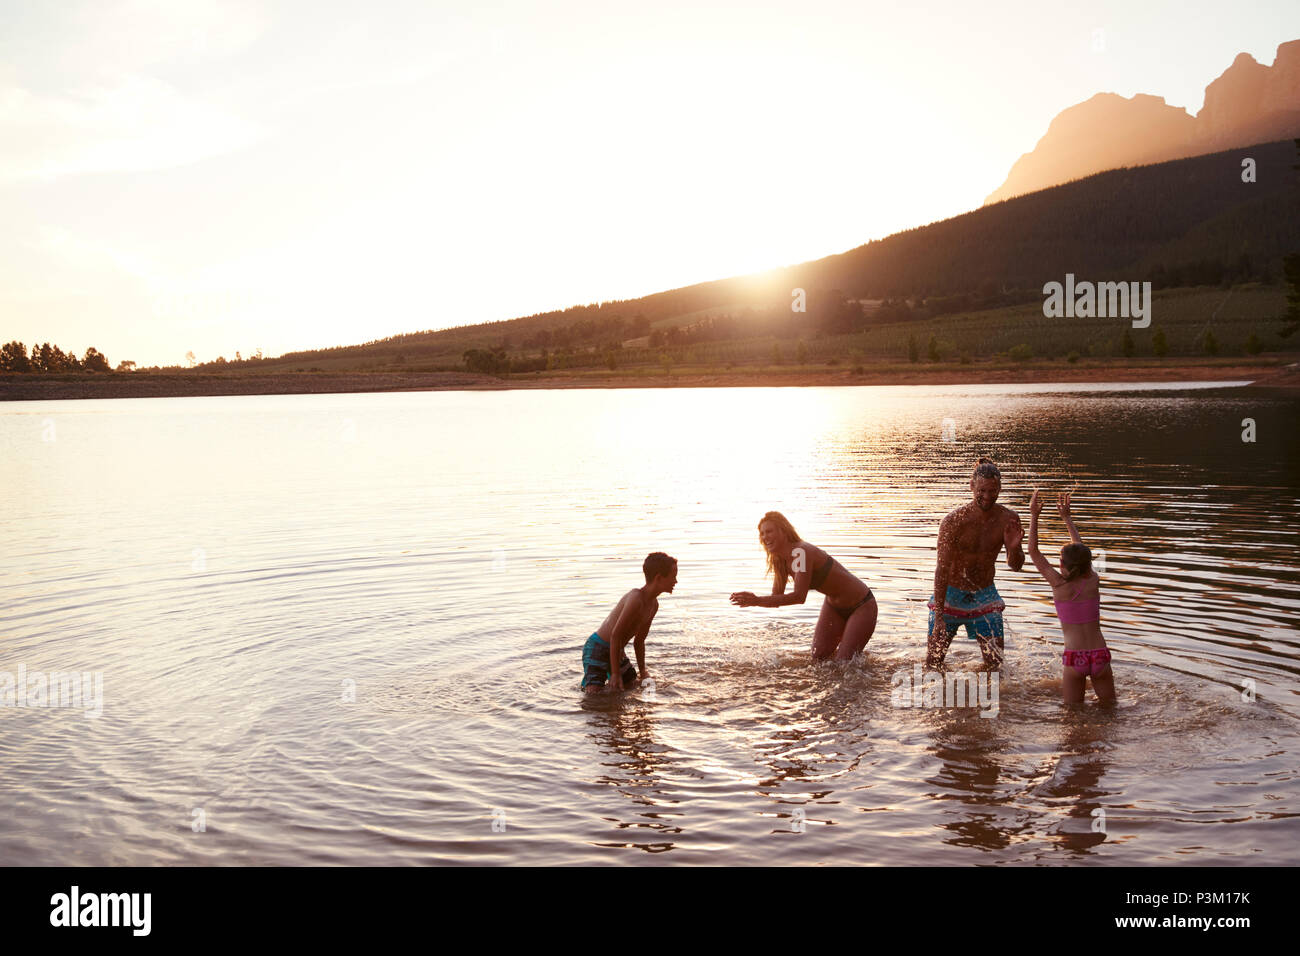 Family Enjoying Evening Swim In Countryside Lake - Stock Image